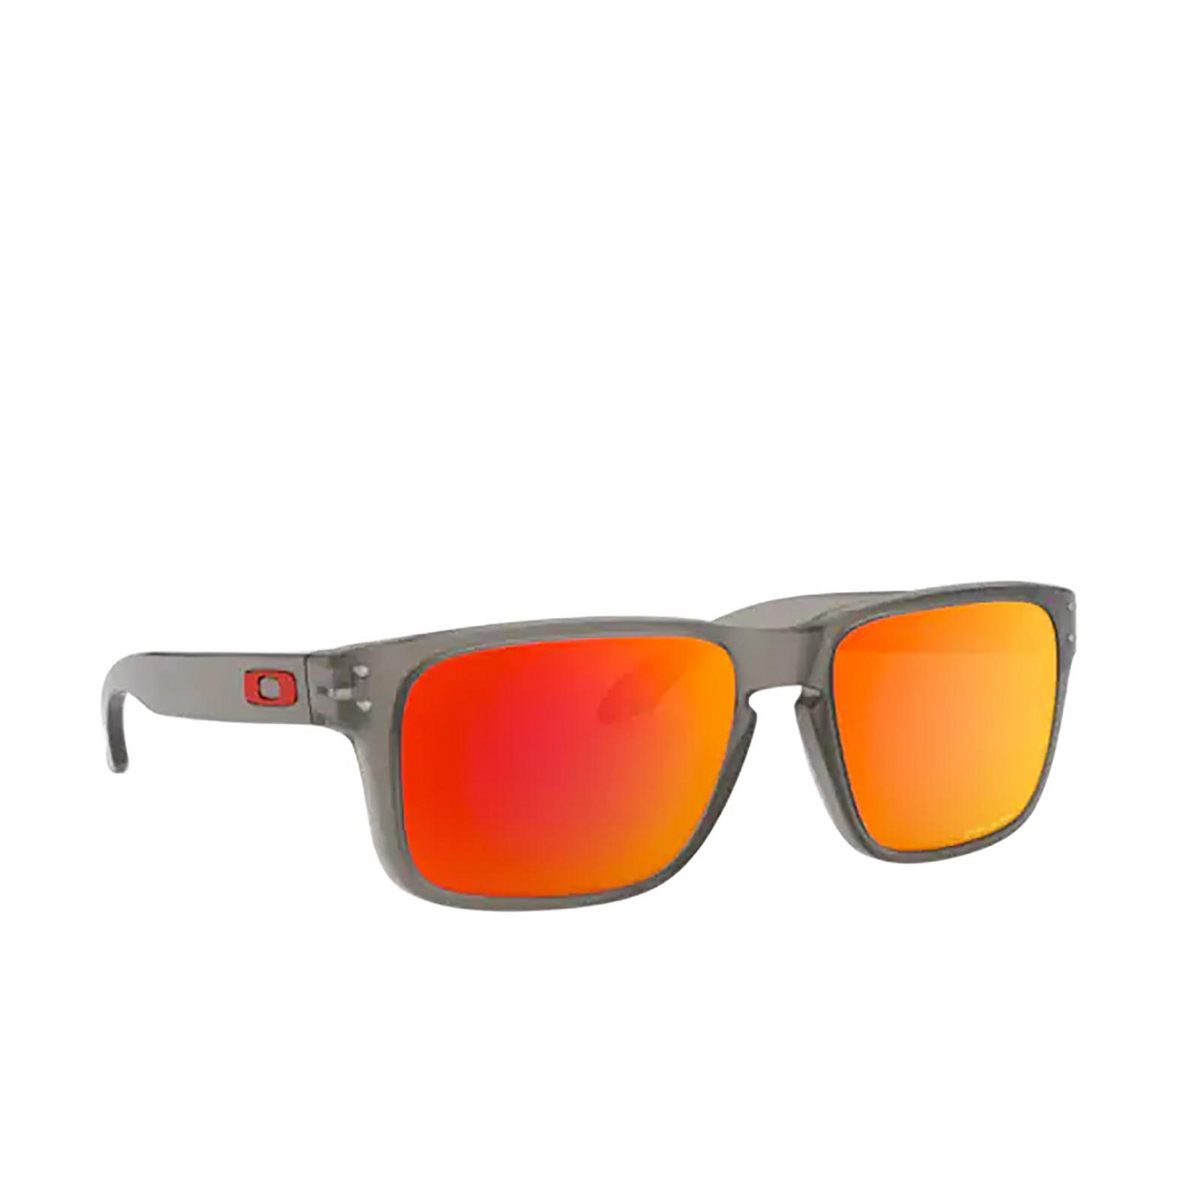 Oakley® Square Sunglasses: Holbrook Xs OJ9007 color Matte Grey Ink 900703 - three-quarters view.